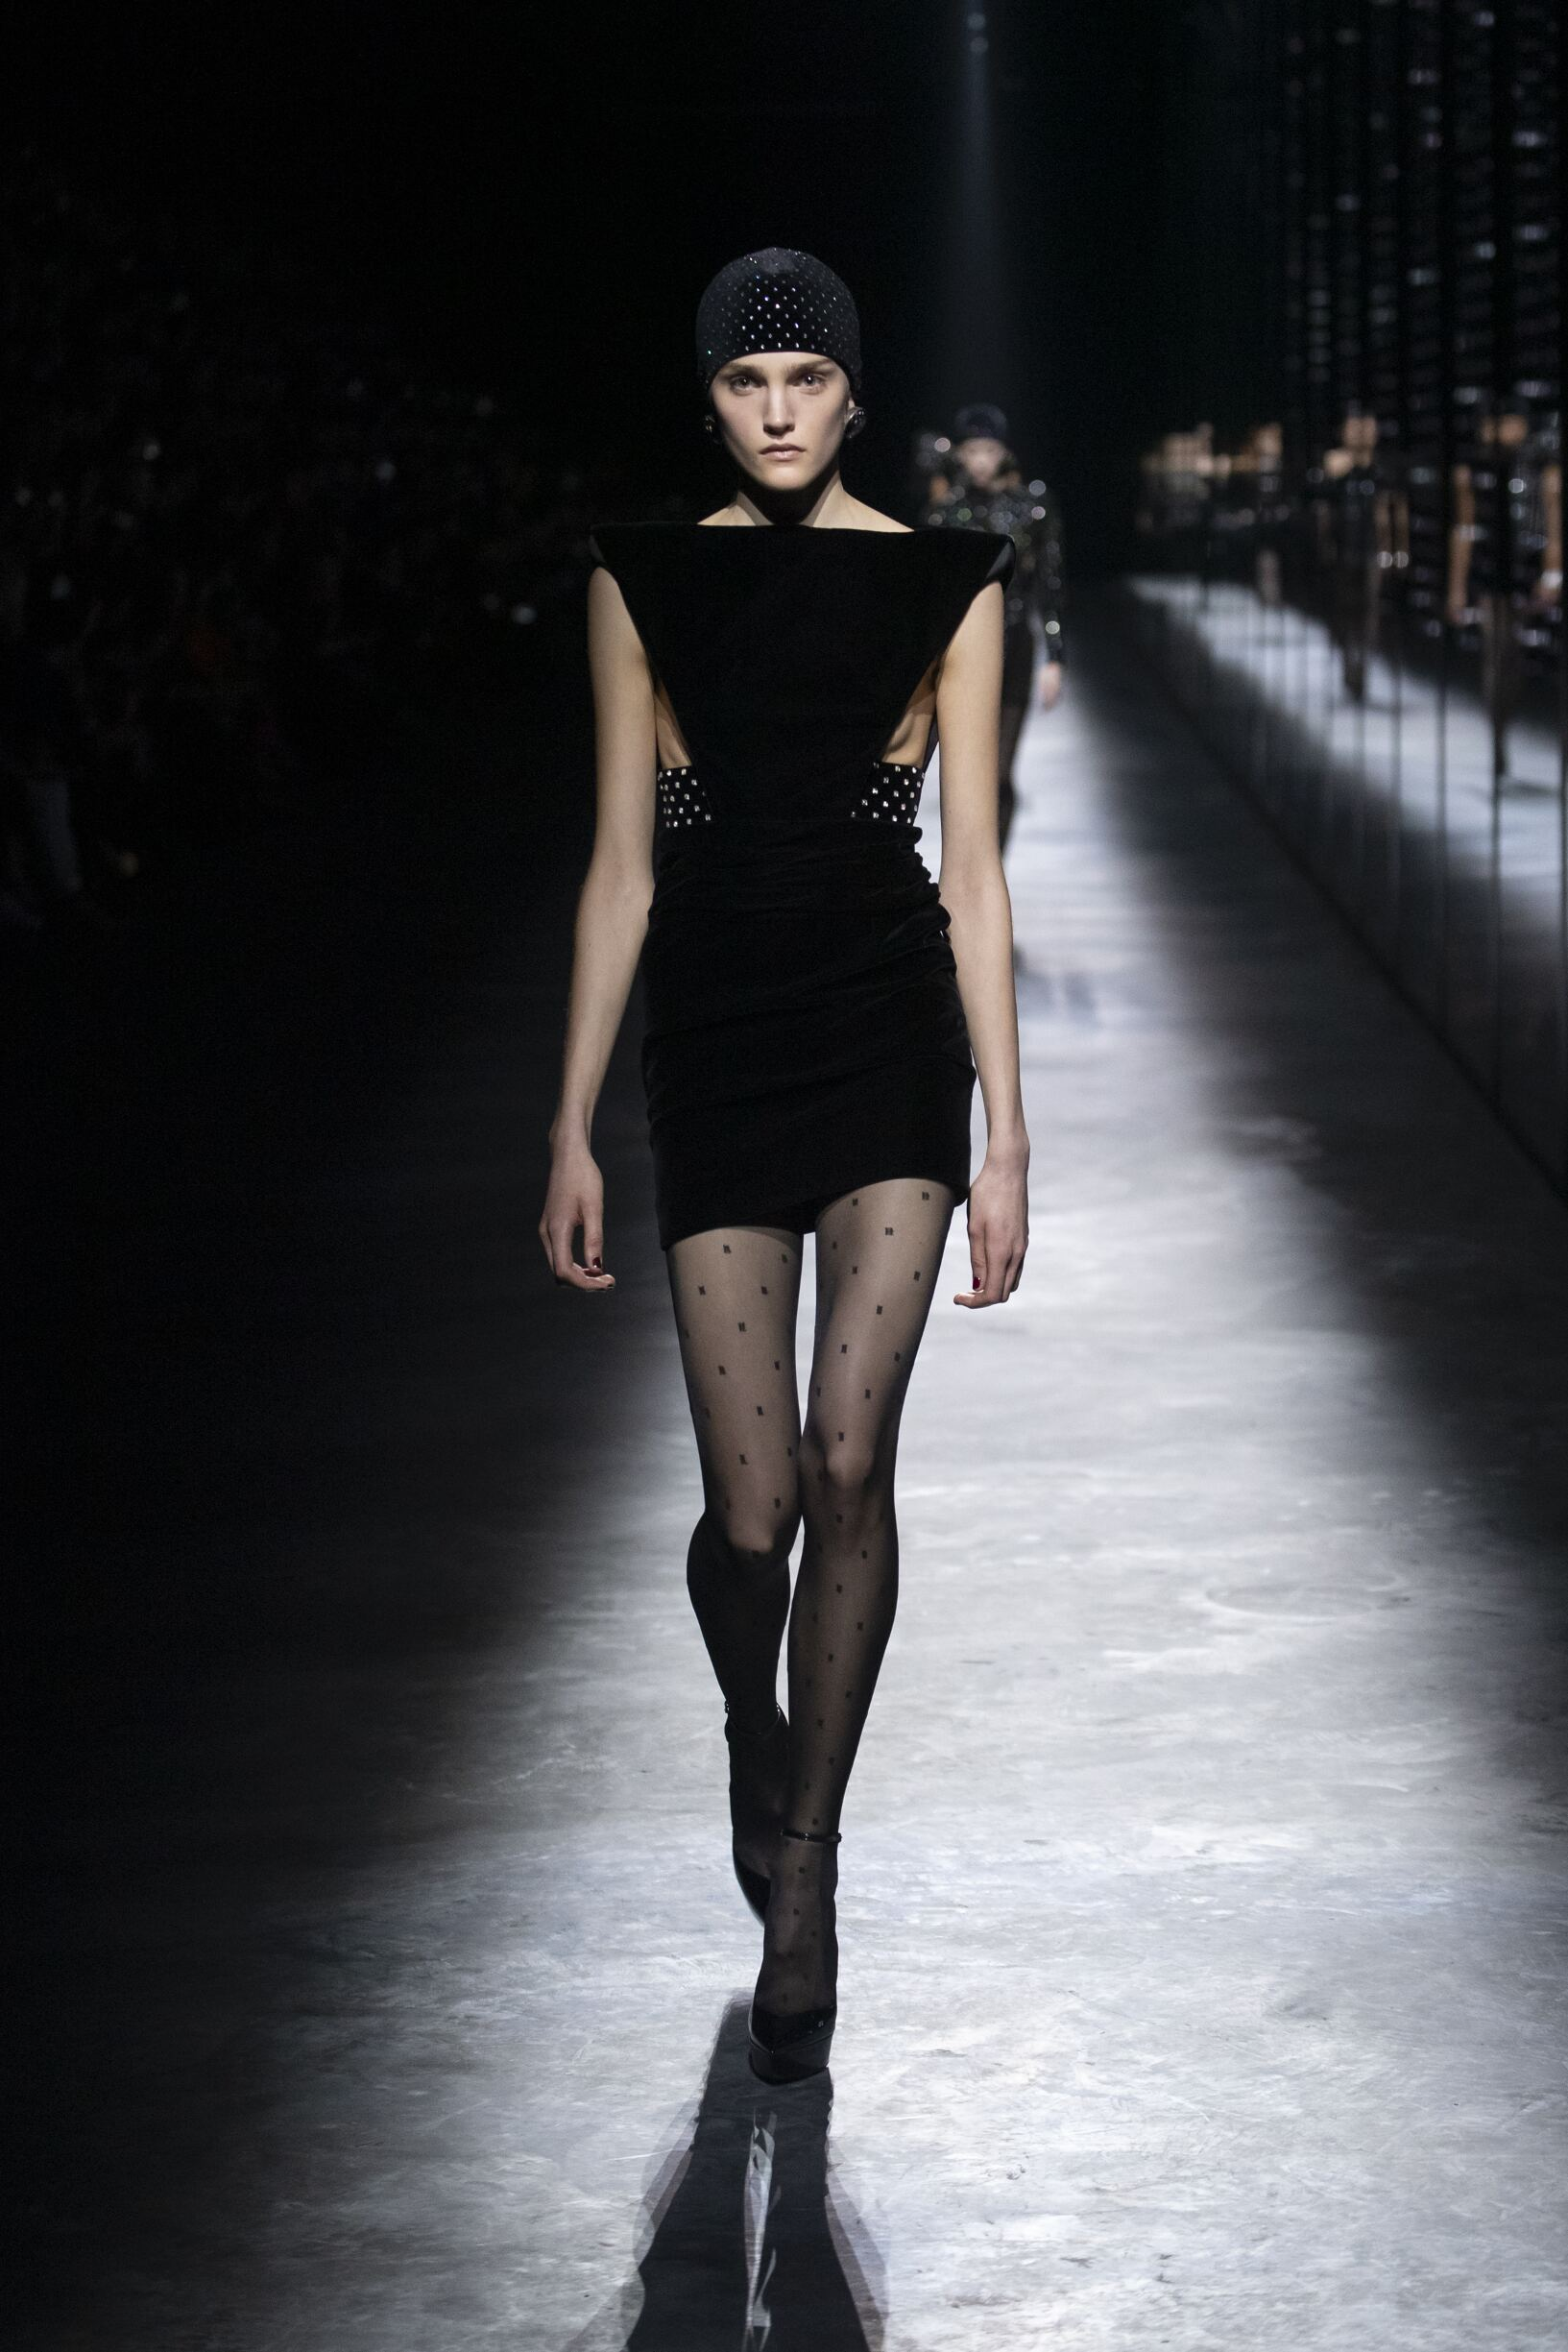 Catwalk Saint Laurent